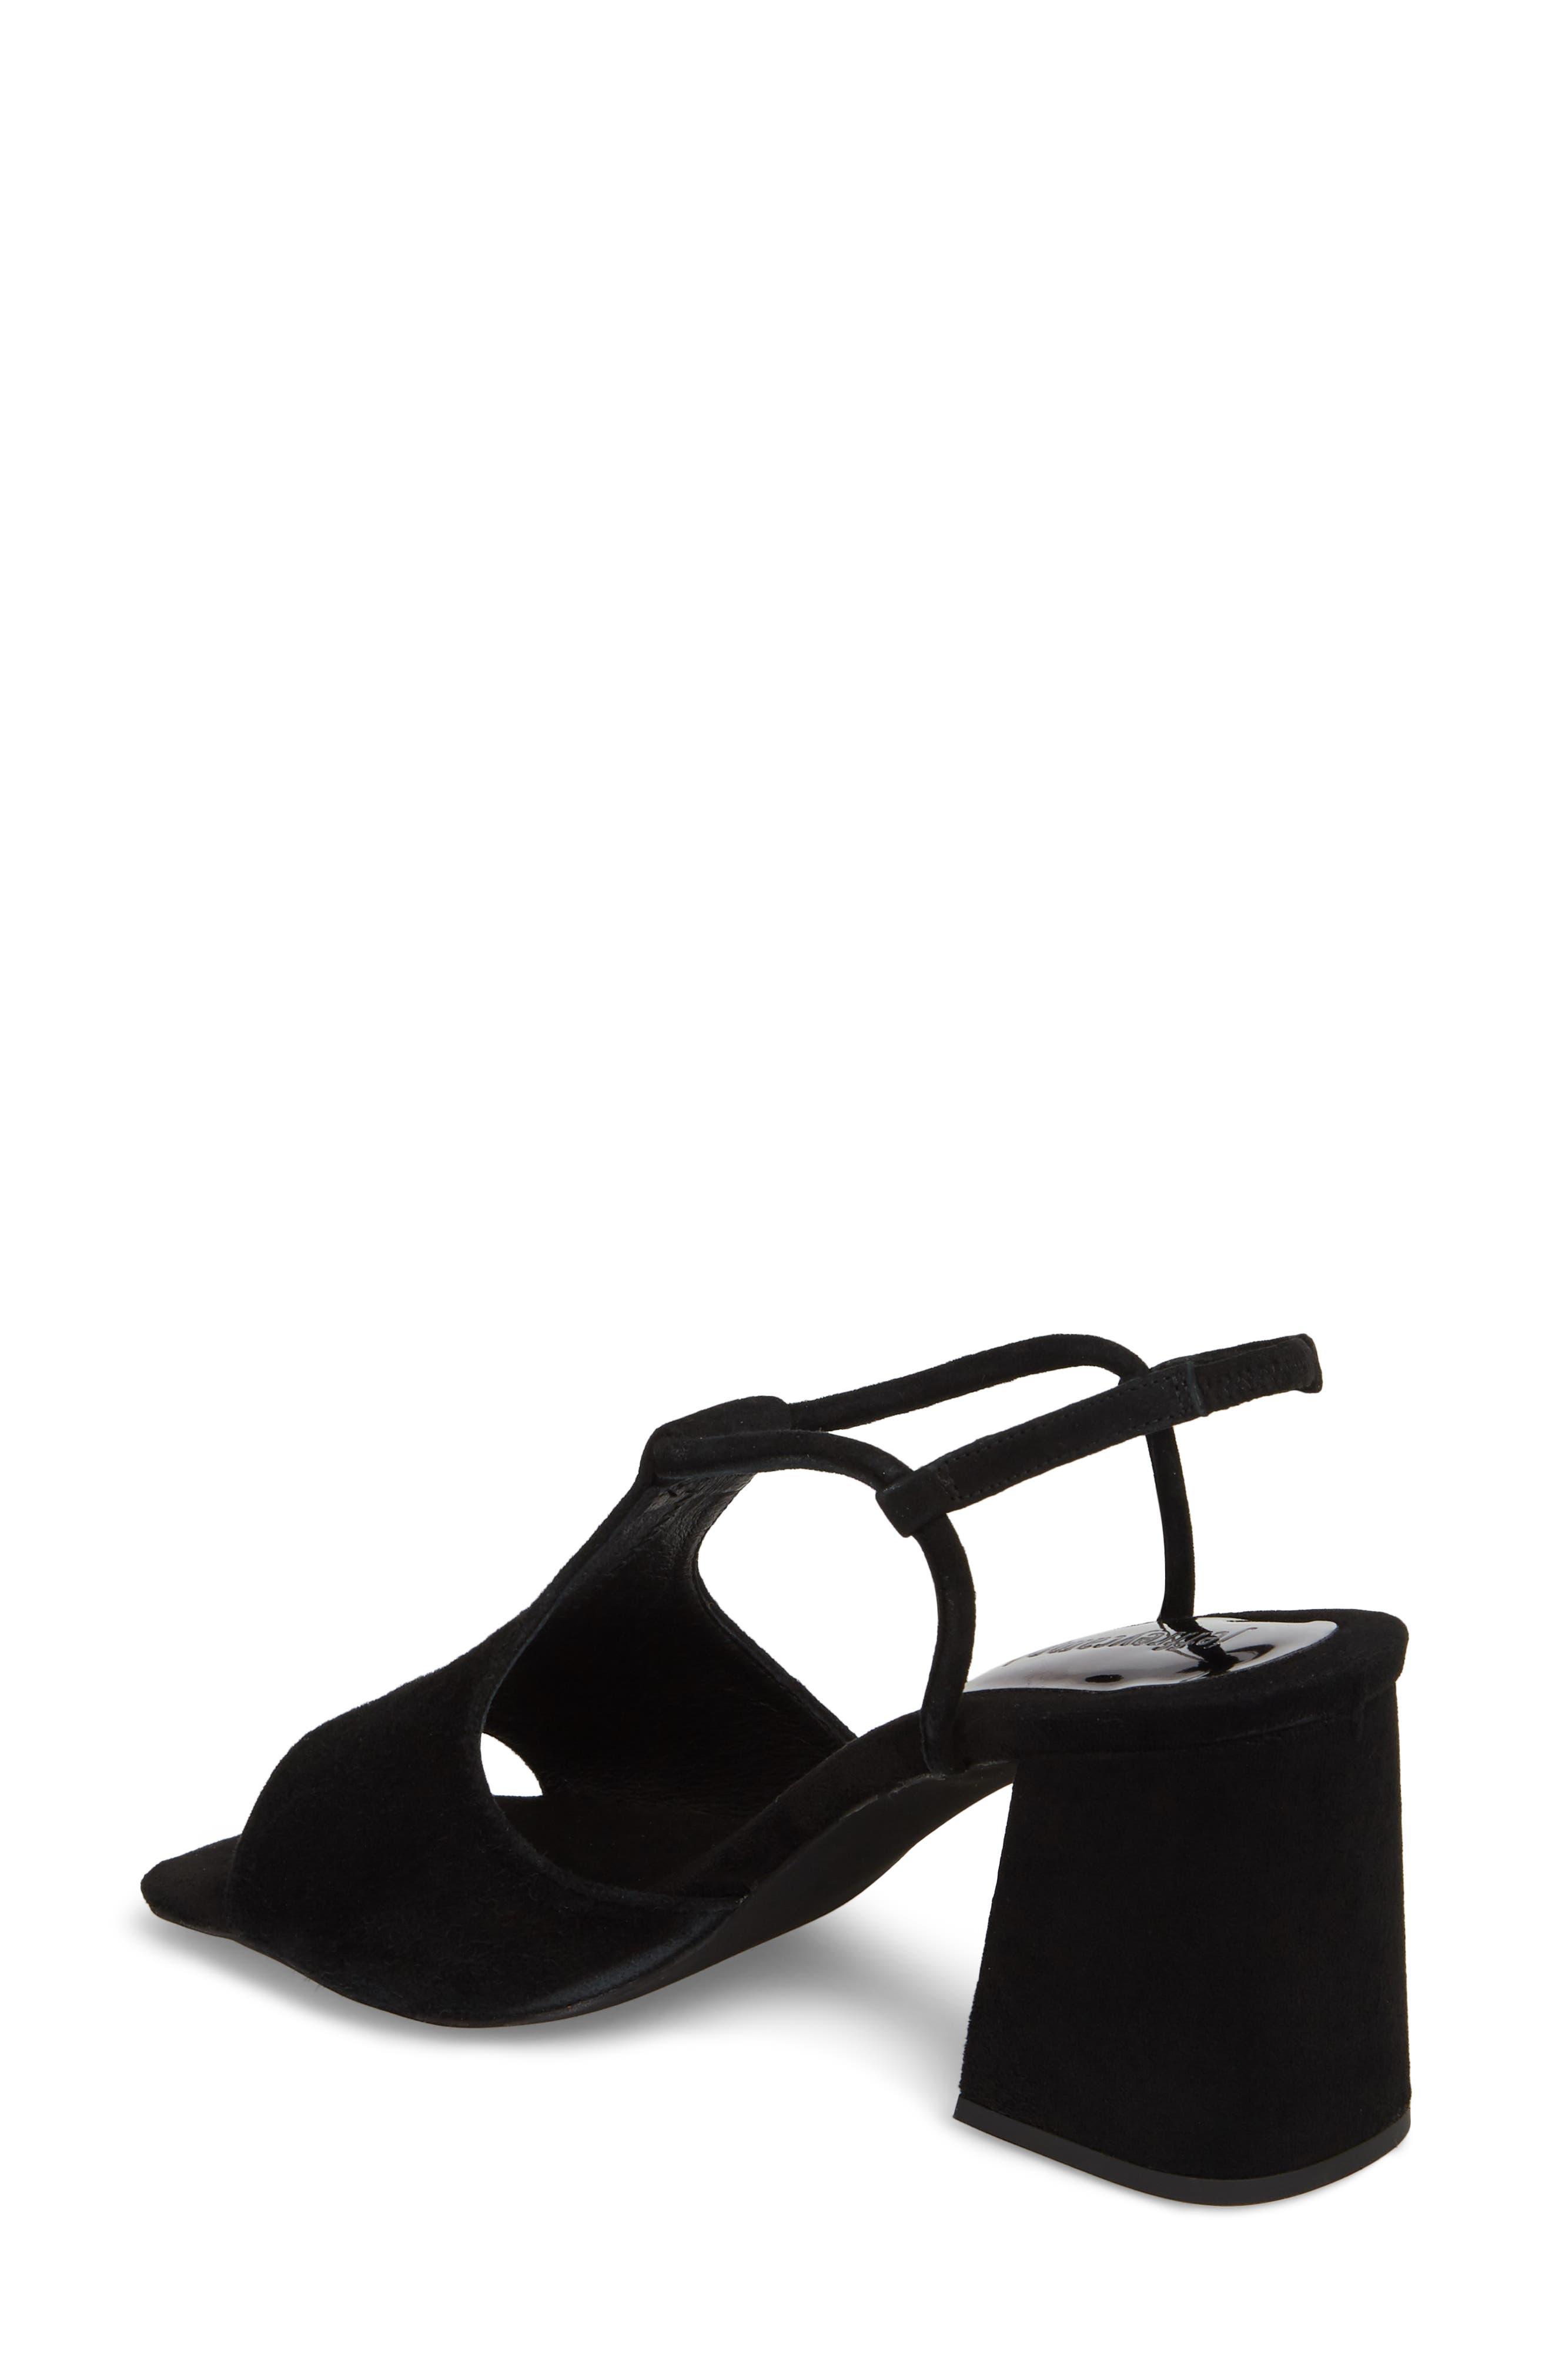 Mercedes Halter Sandal,                             Alternate thumbnail 2, color,                             Black Suede